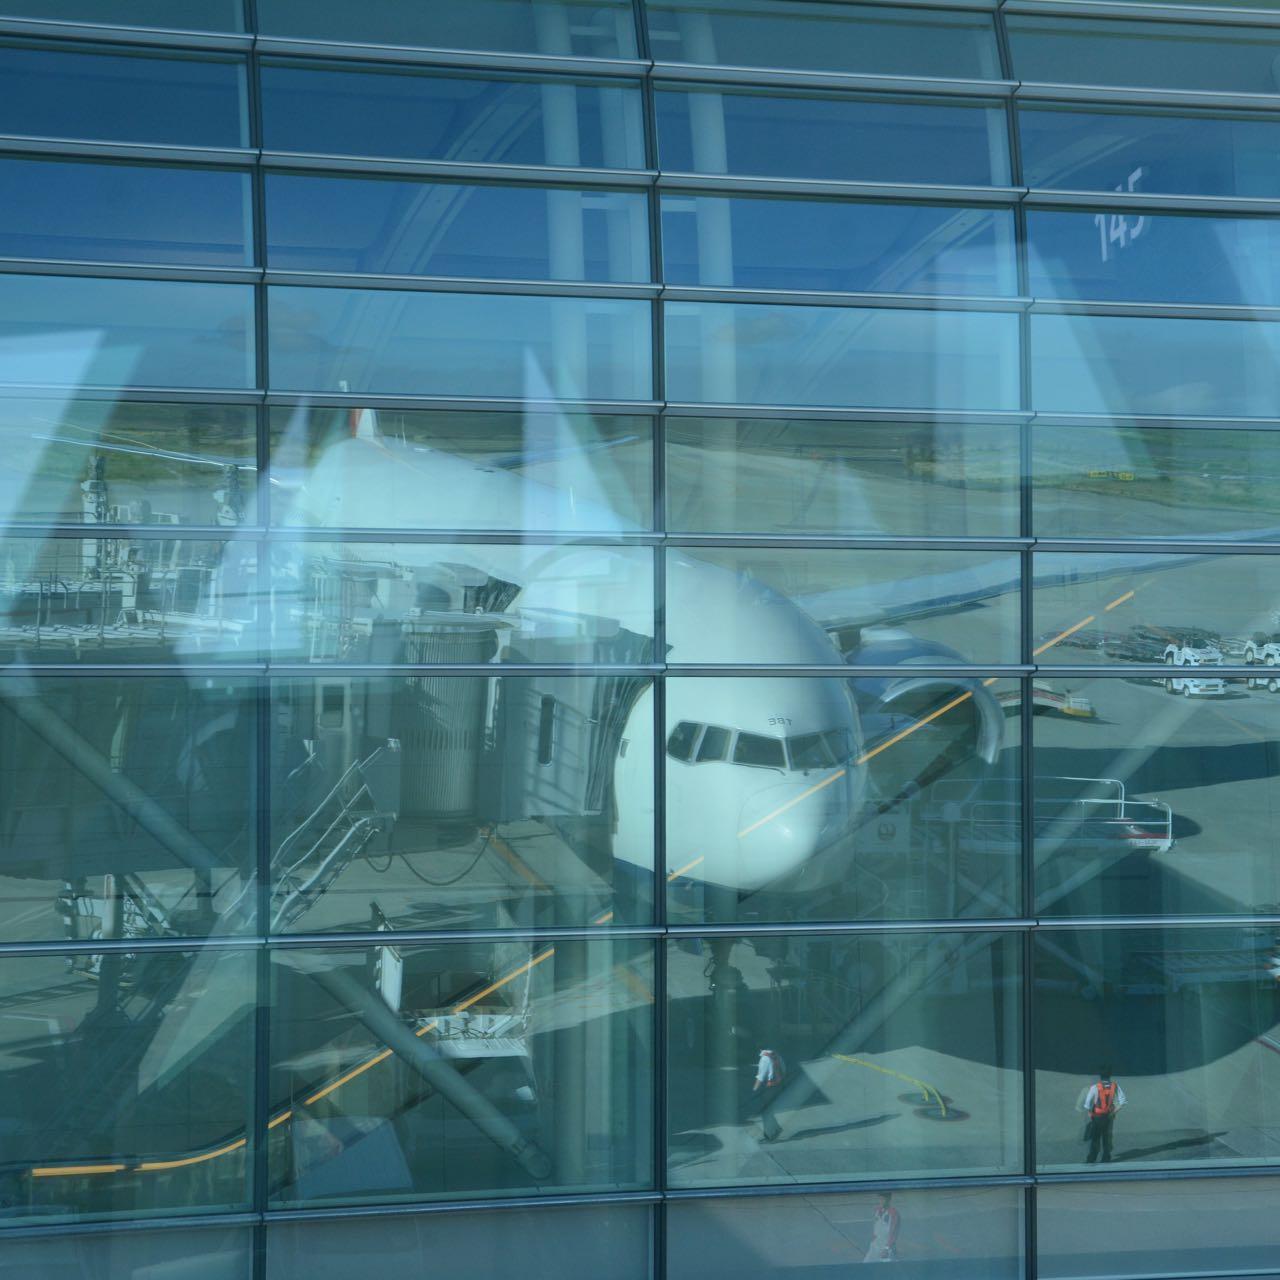 plane mirror image Haneda airport